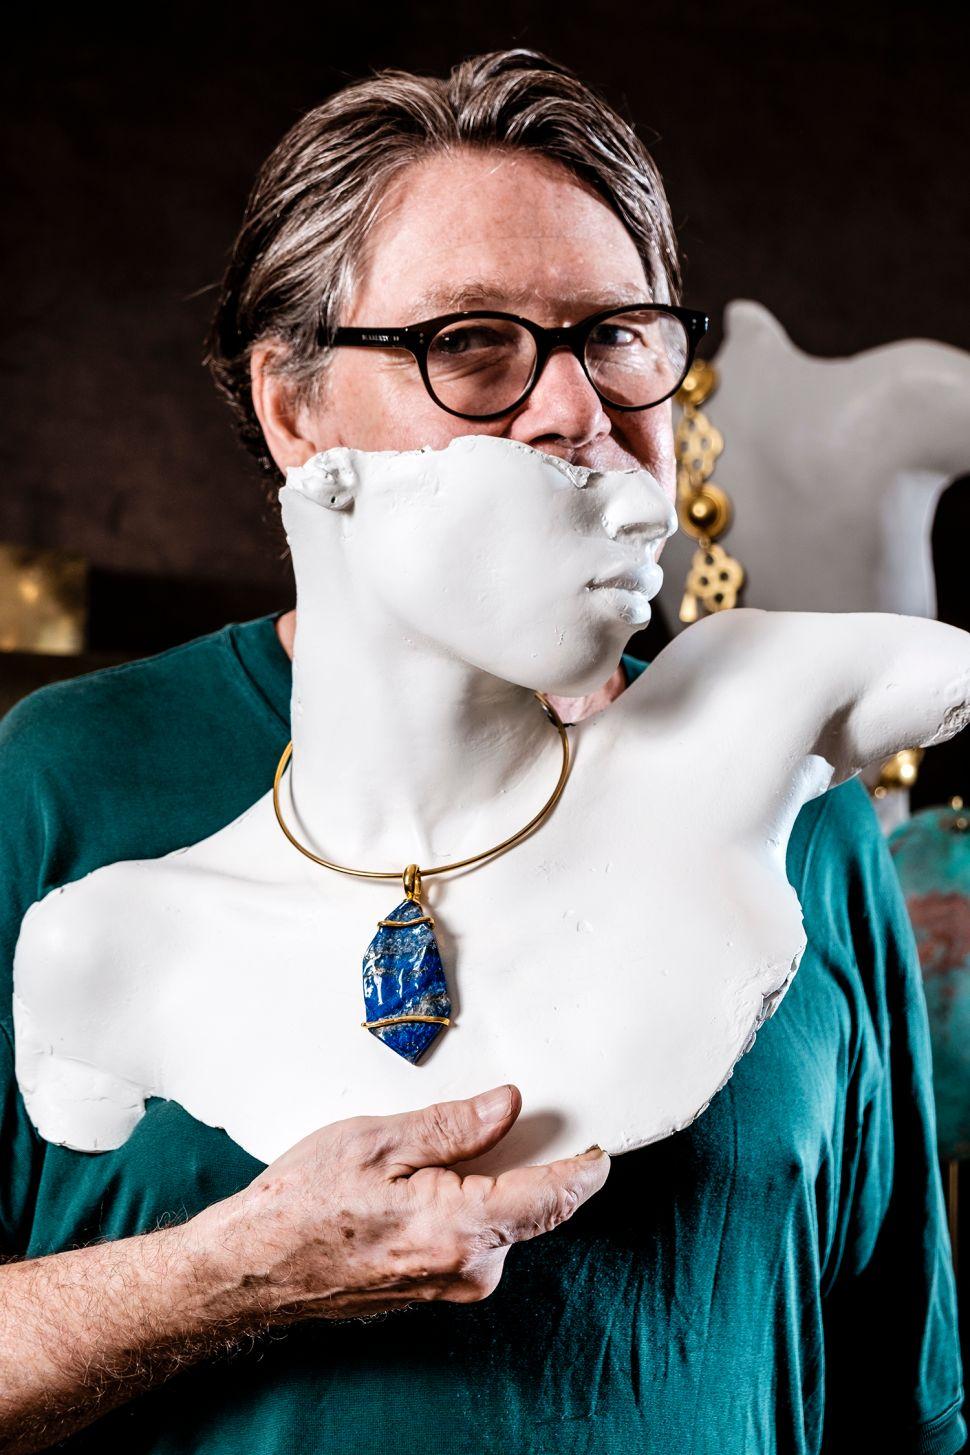 Metal Master Robert Lee Morris on Jewels and Junk